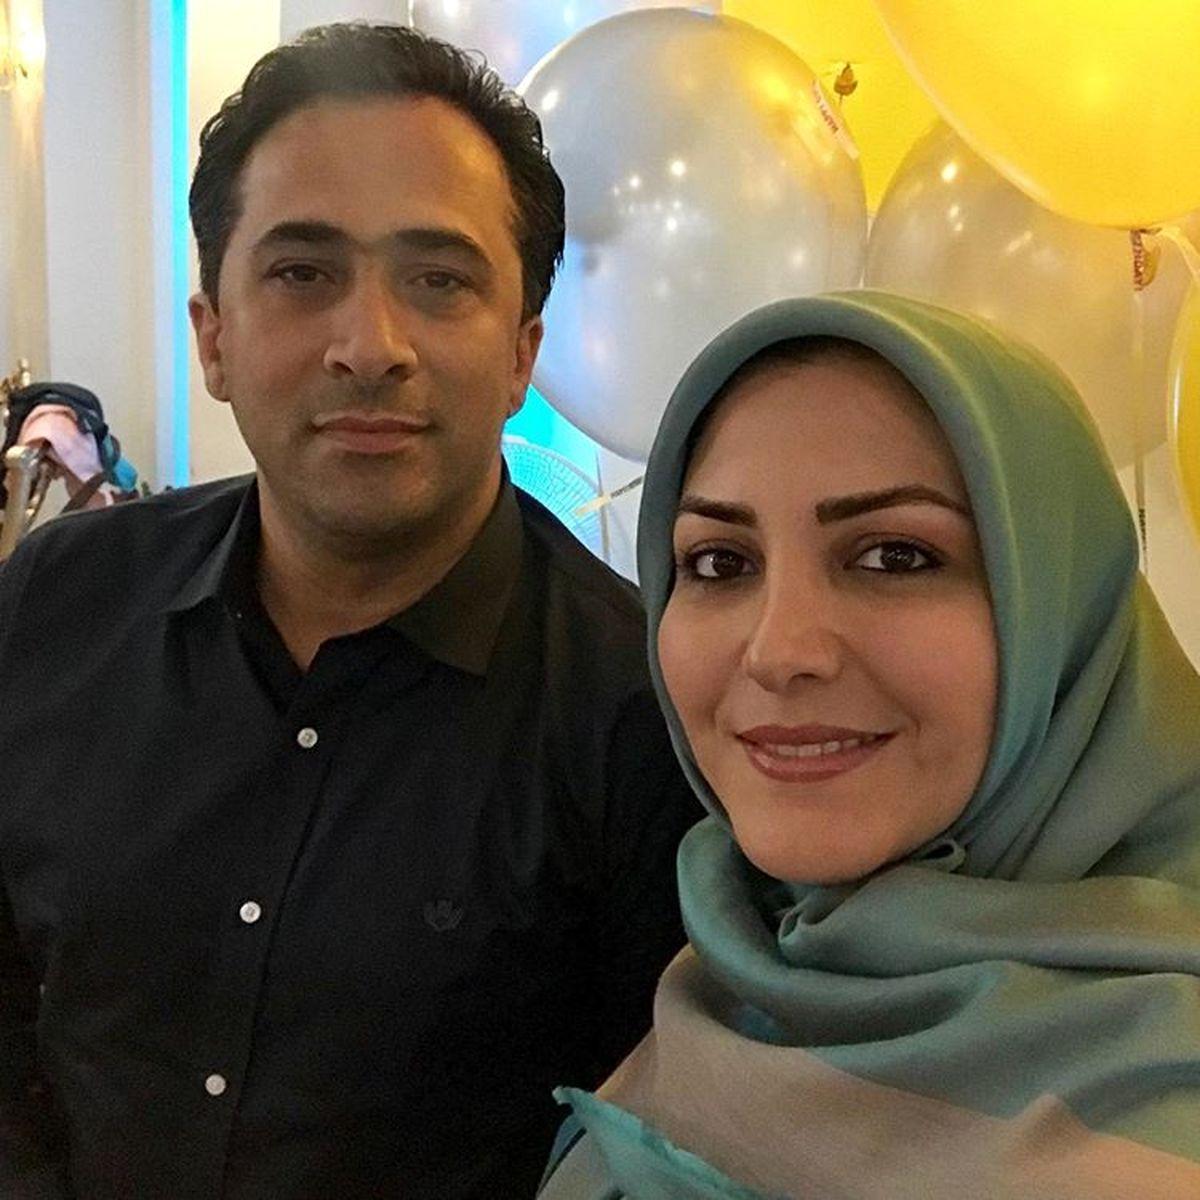 عاشقانه های المیرا شریفی مقدم و همسرش + عکس